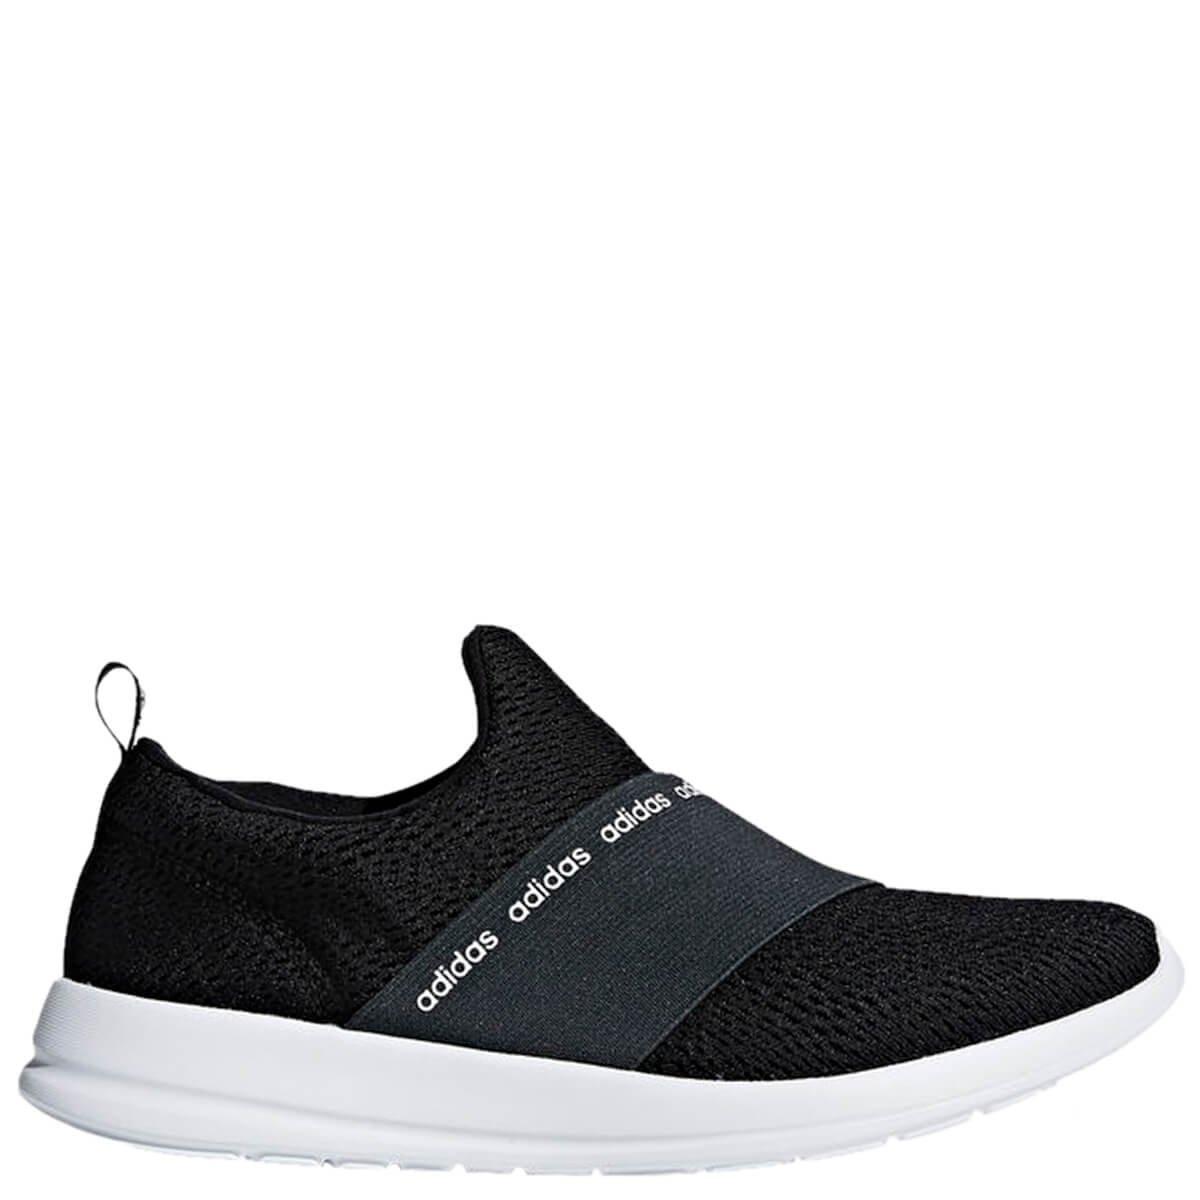 66f2619033a Bizz Store - Tênis Adidas Feminino Refine Adapt